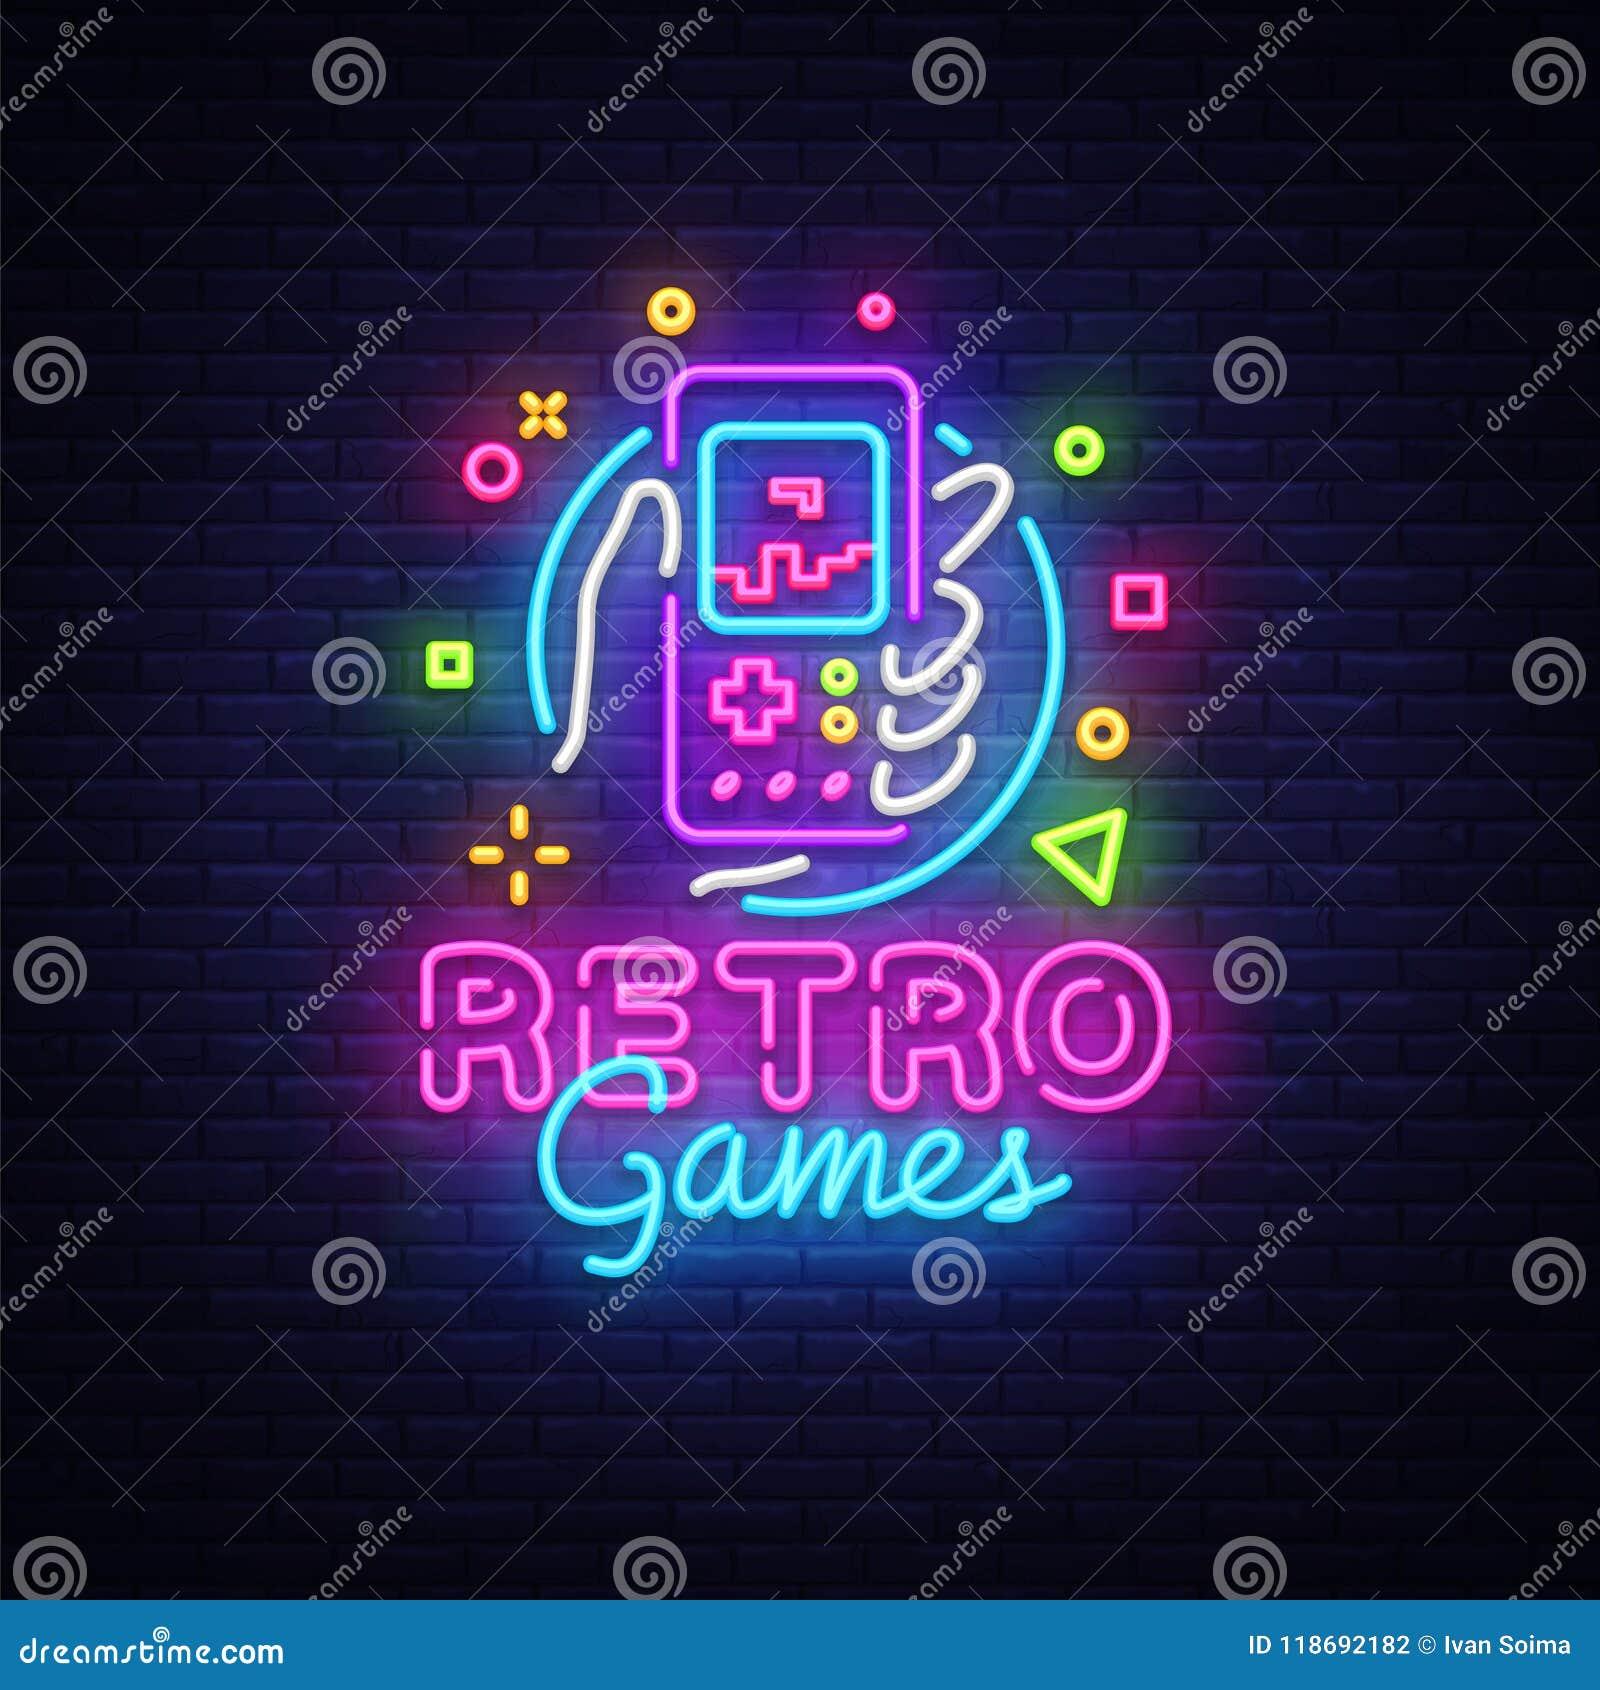 Retro Games Vector Logo Retro Geek Gaming Gamepad In Hand Neon Sign Modern Trend Design Vivid Vector Illustration Stock Vector Illustration Of Controller Control 118692182